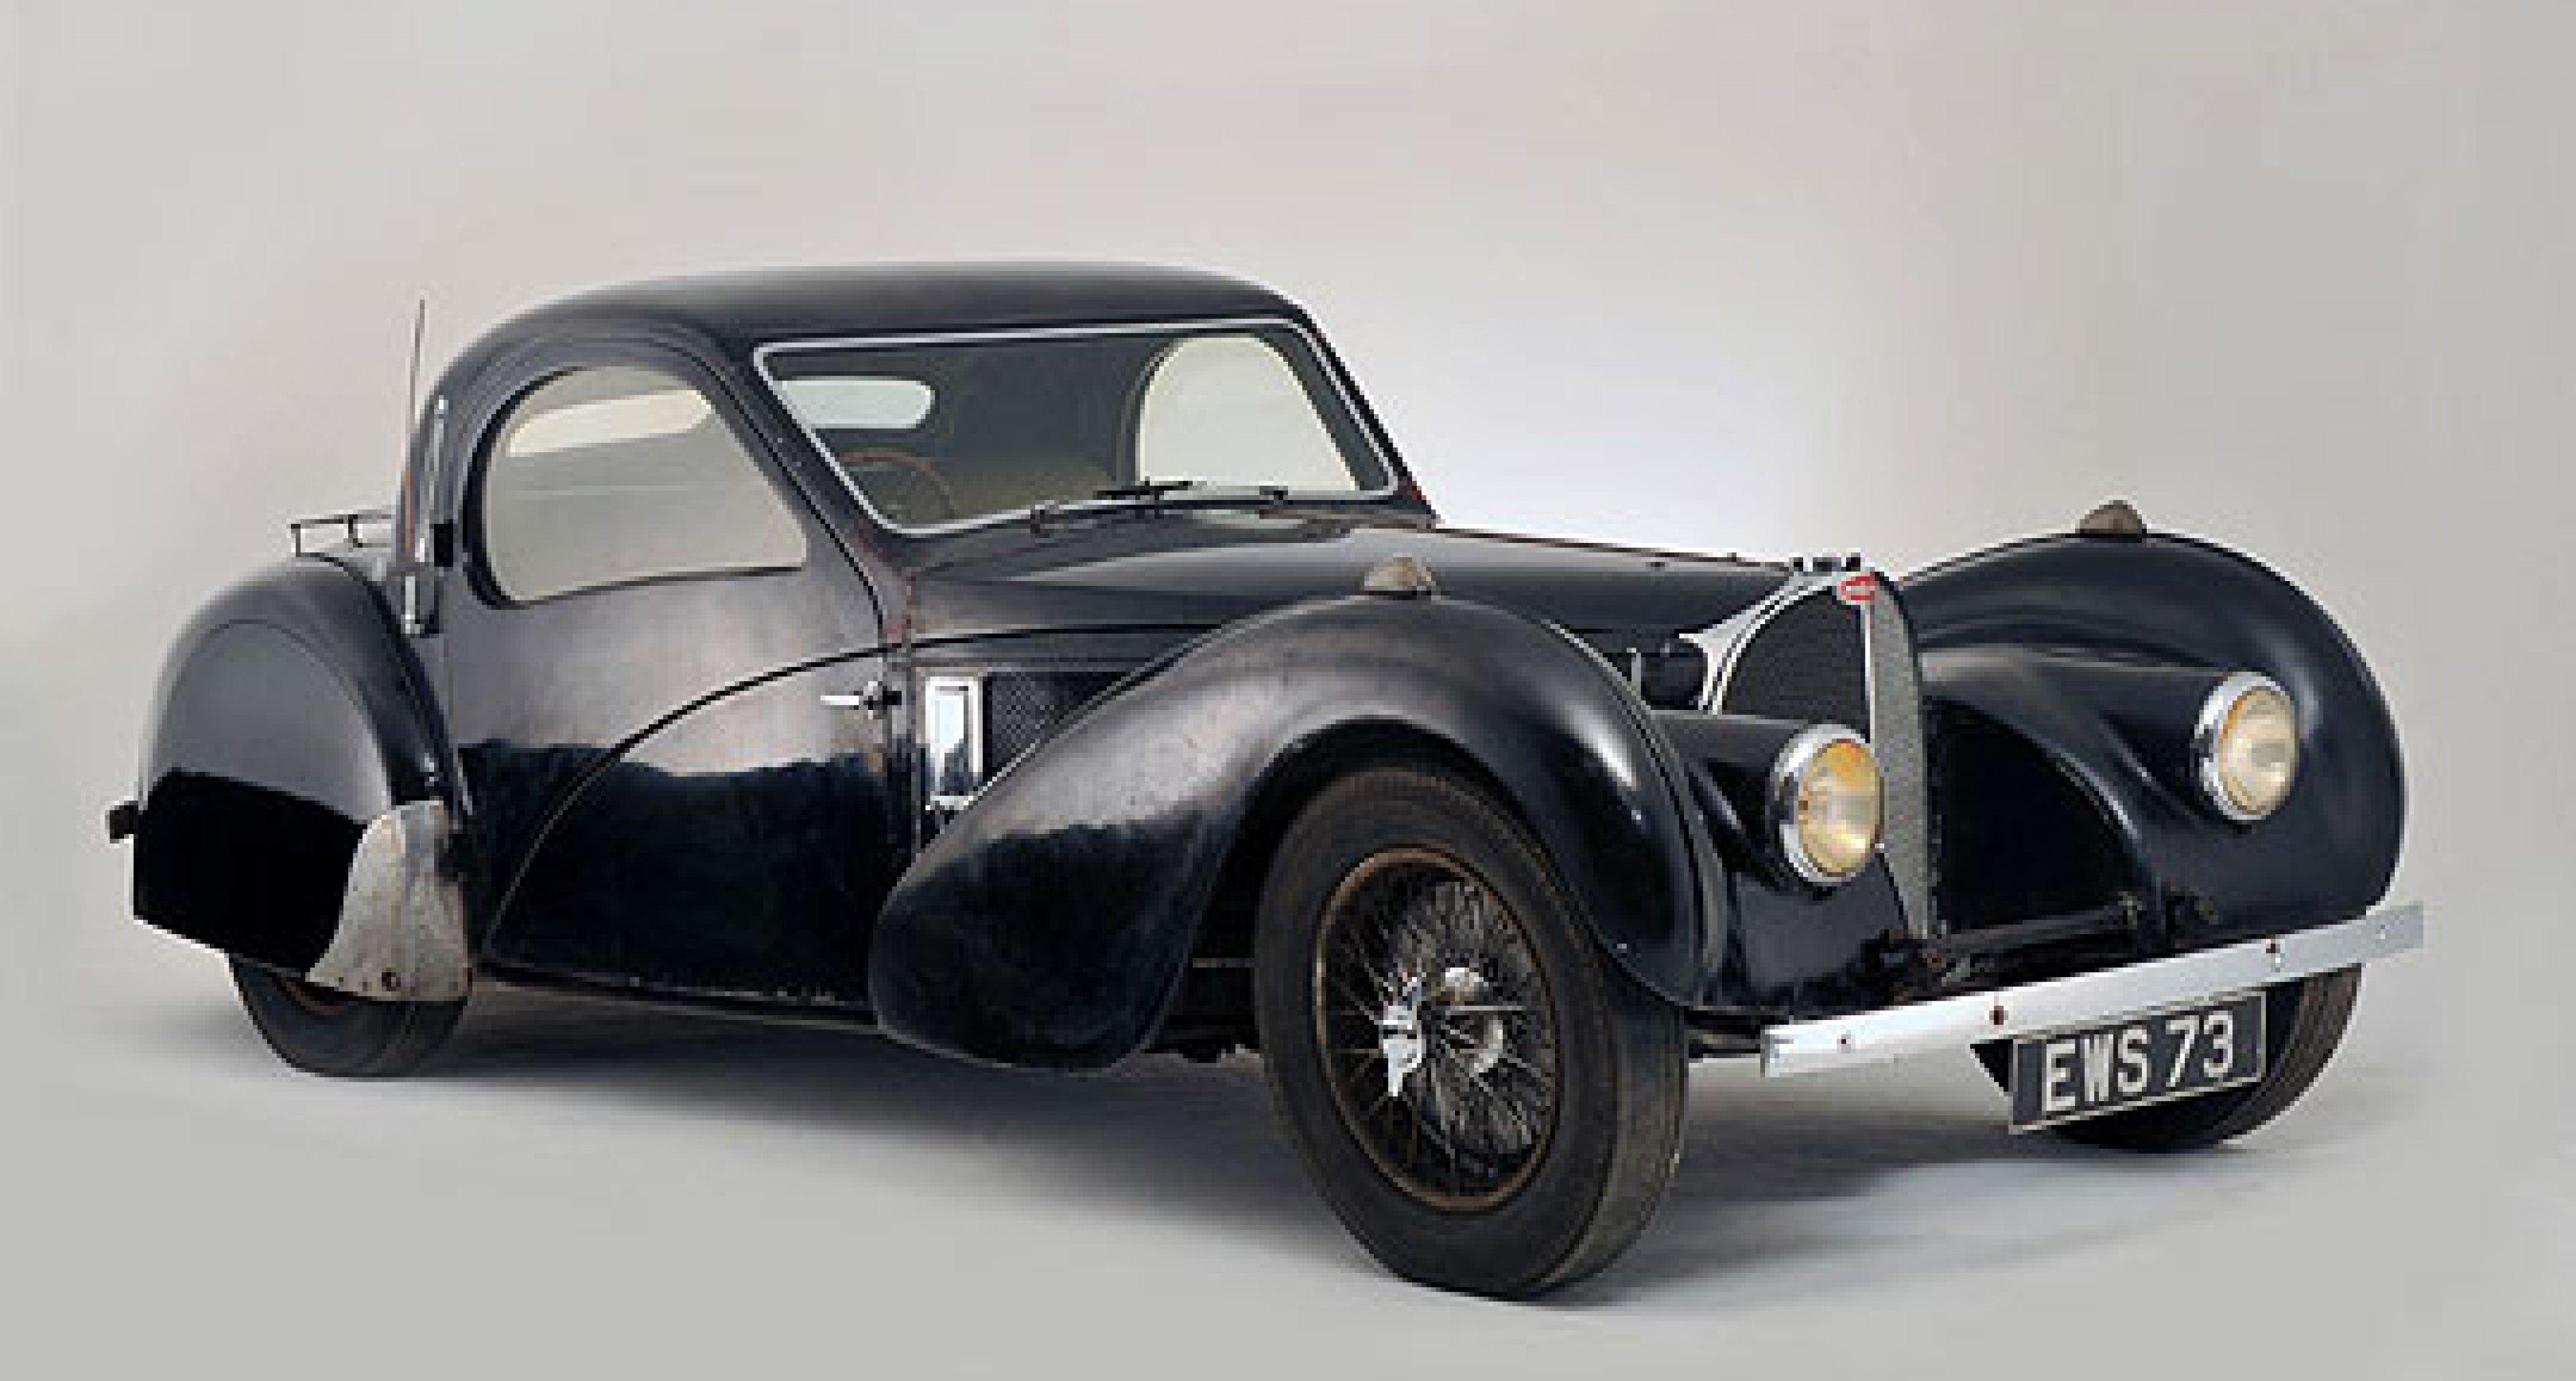 Bonhams to Sell Unrestored Bugatti T57S at Rétromobile 2009